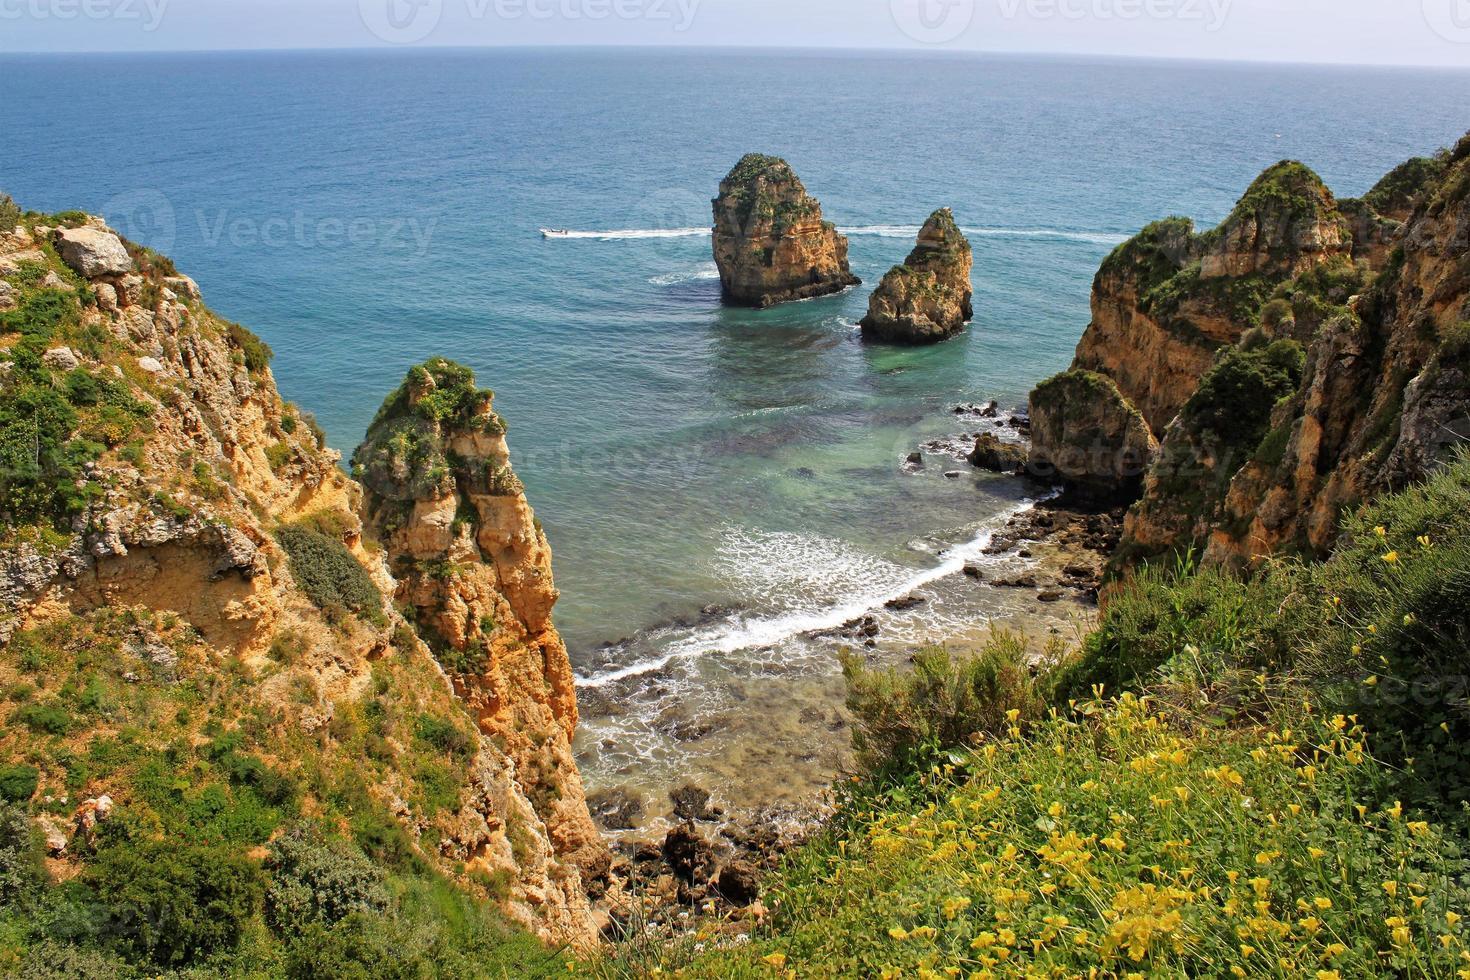 Algarve cliffs photo